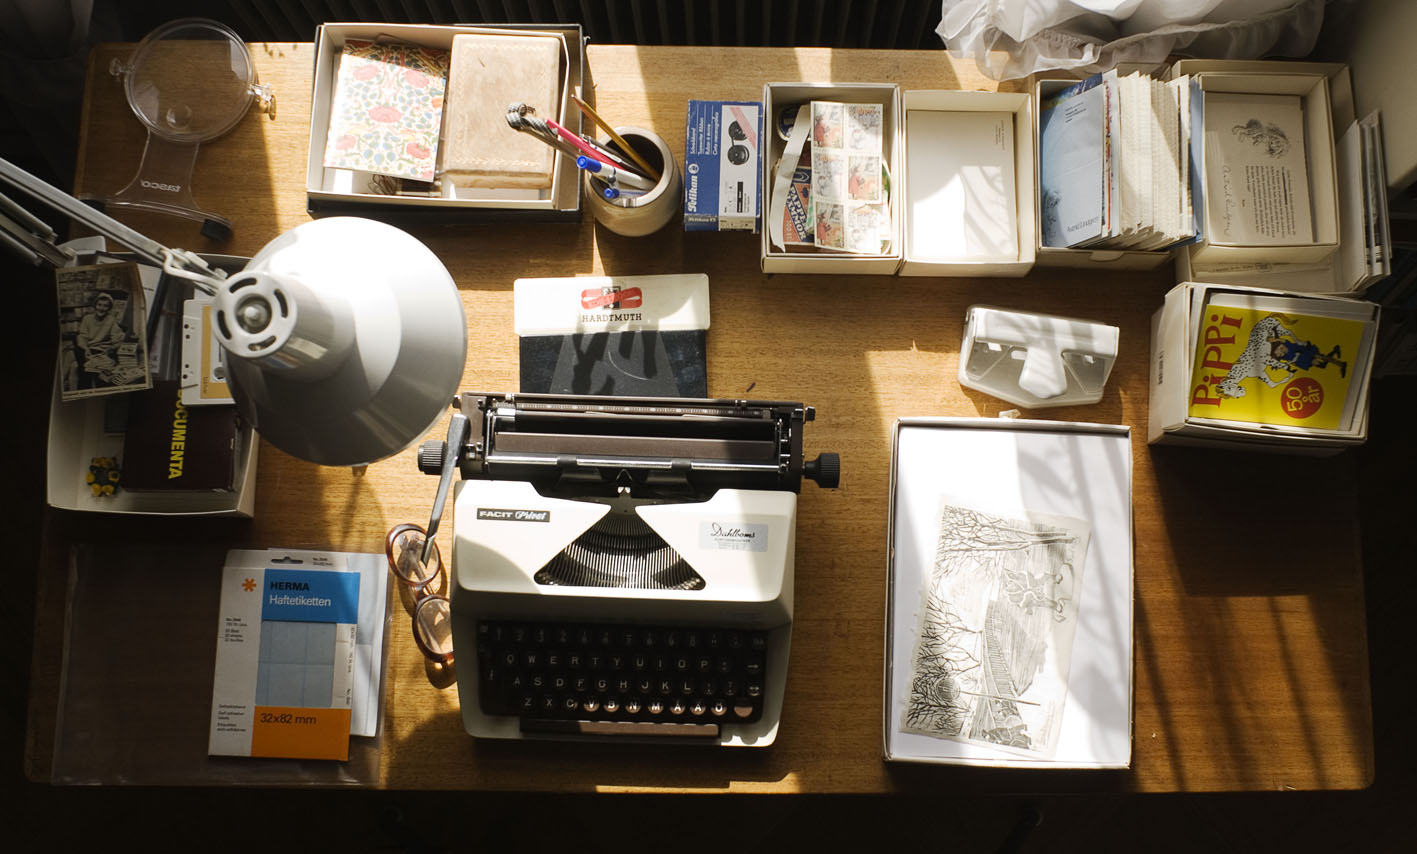 Astrid Lindgren skrivbord med hennes skrivmaskin, brev och manuskript .© National Library of Sweden, From exhibition 2008. Photographer: Jessica Lund.